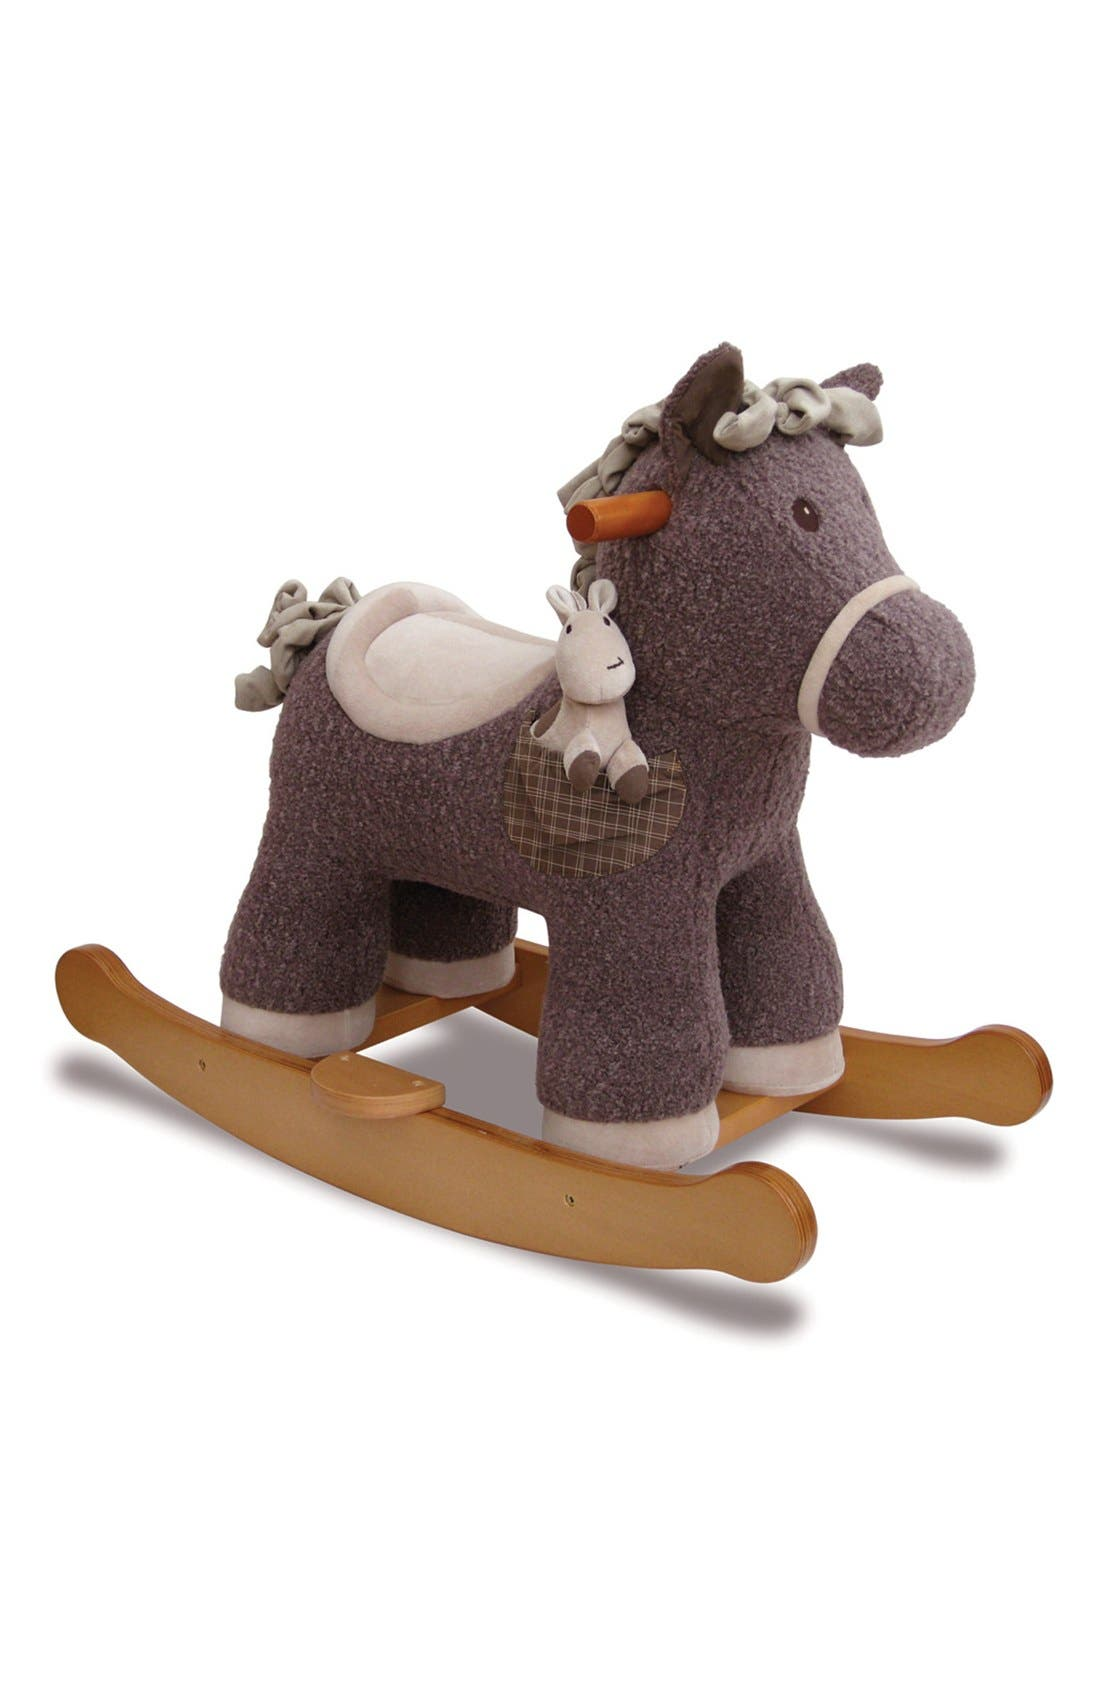 Rocking Horse & Stuffed Animal,                         Main,                         color, 200